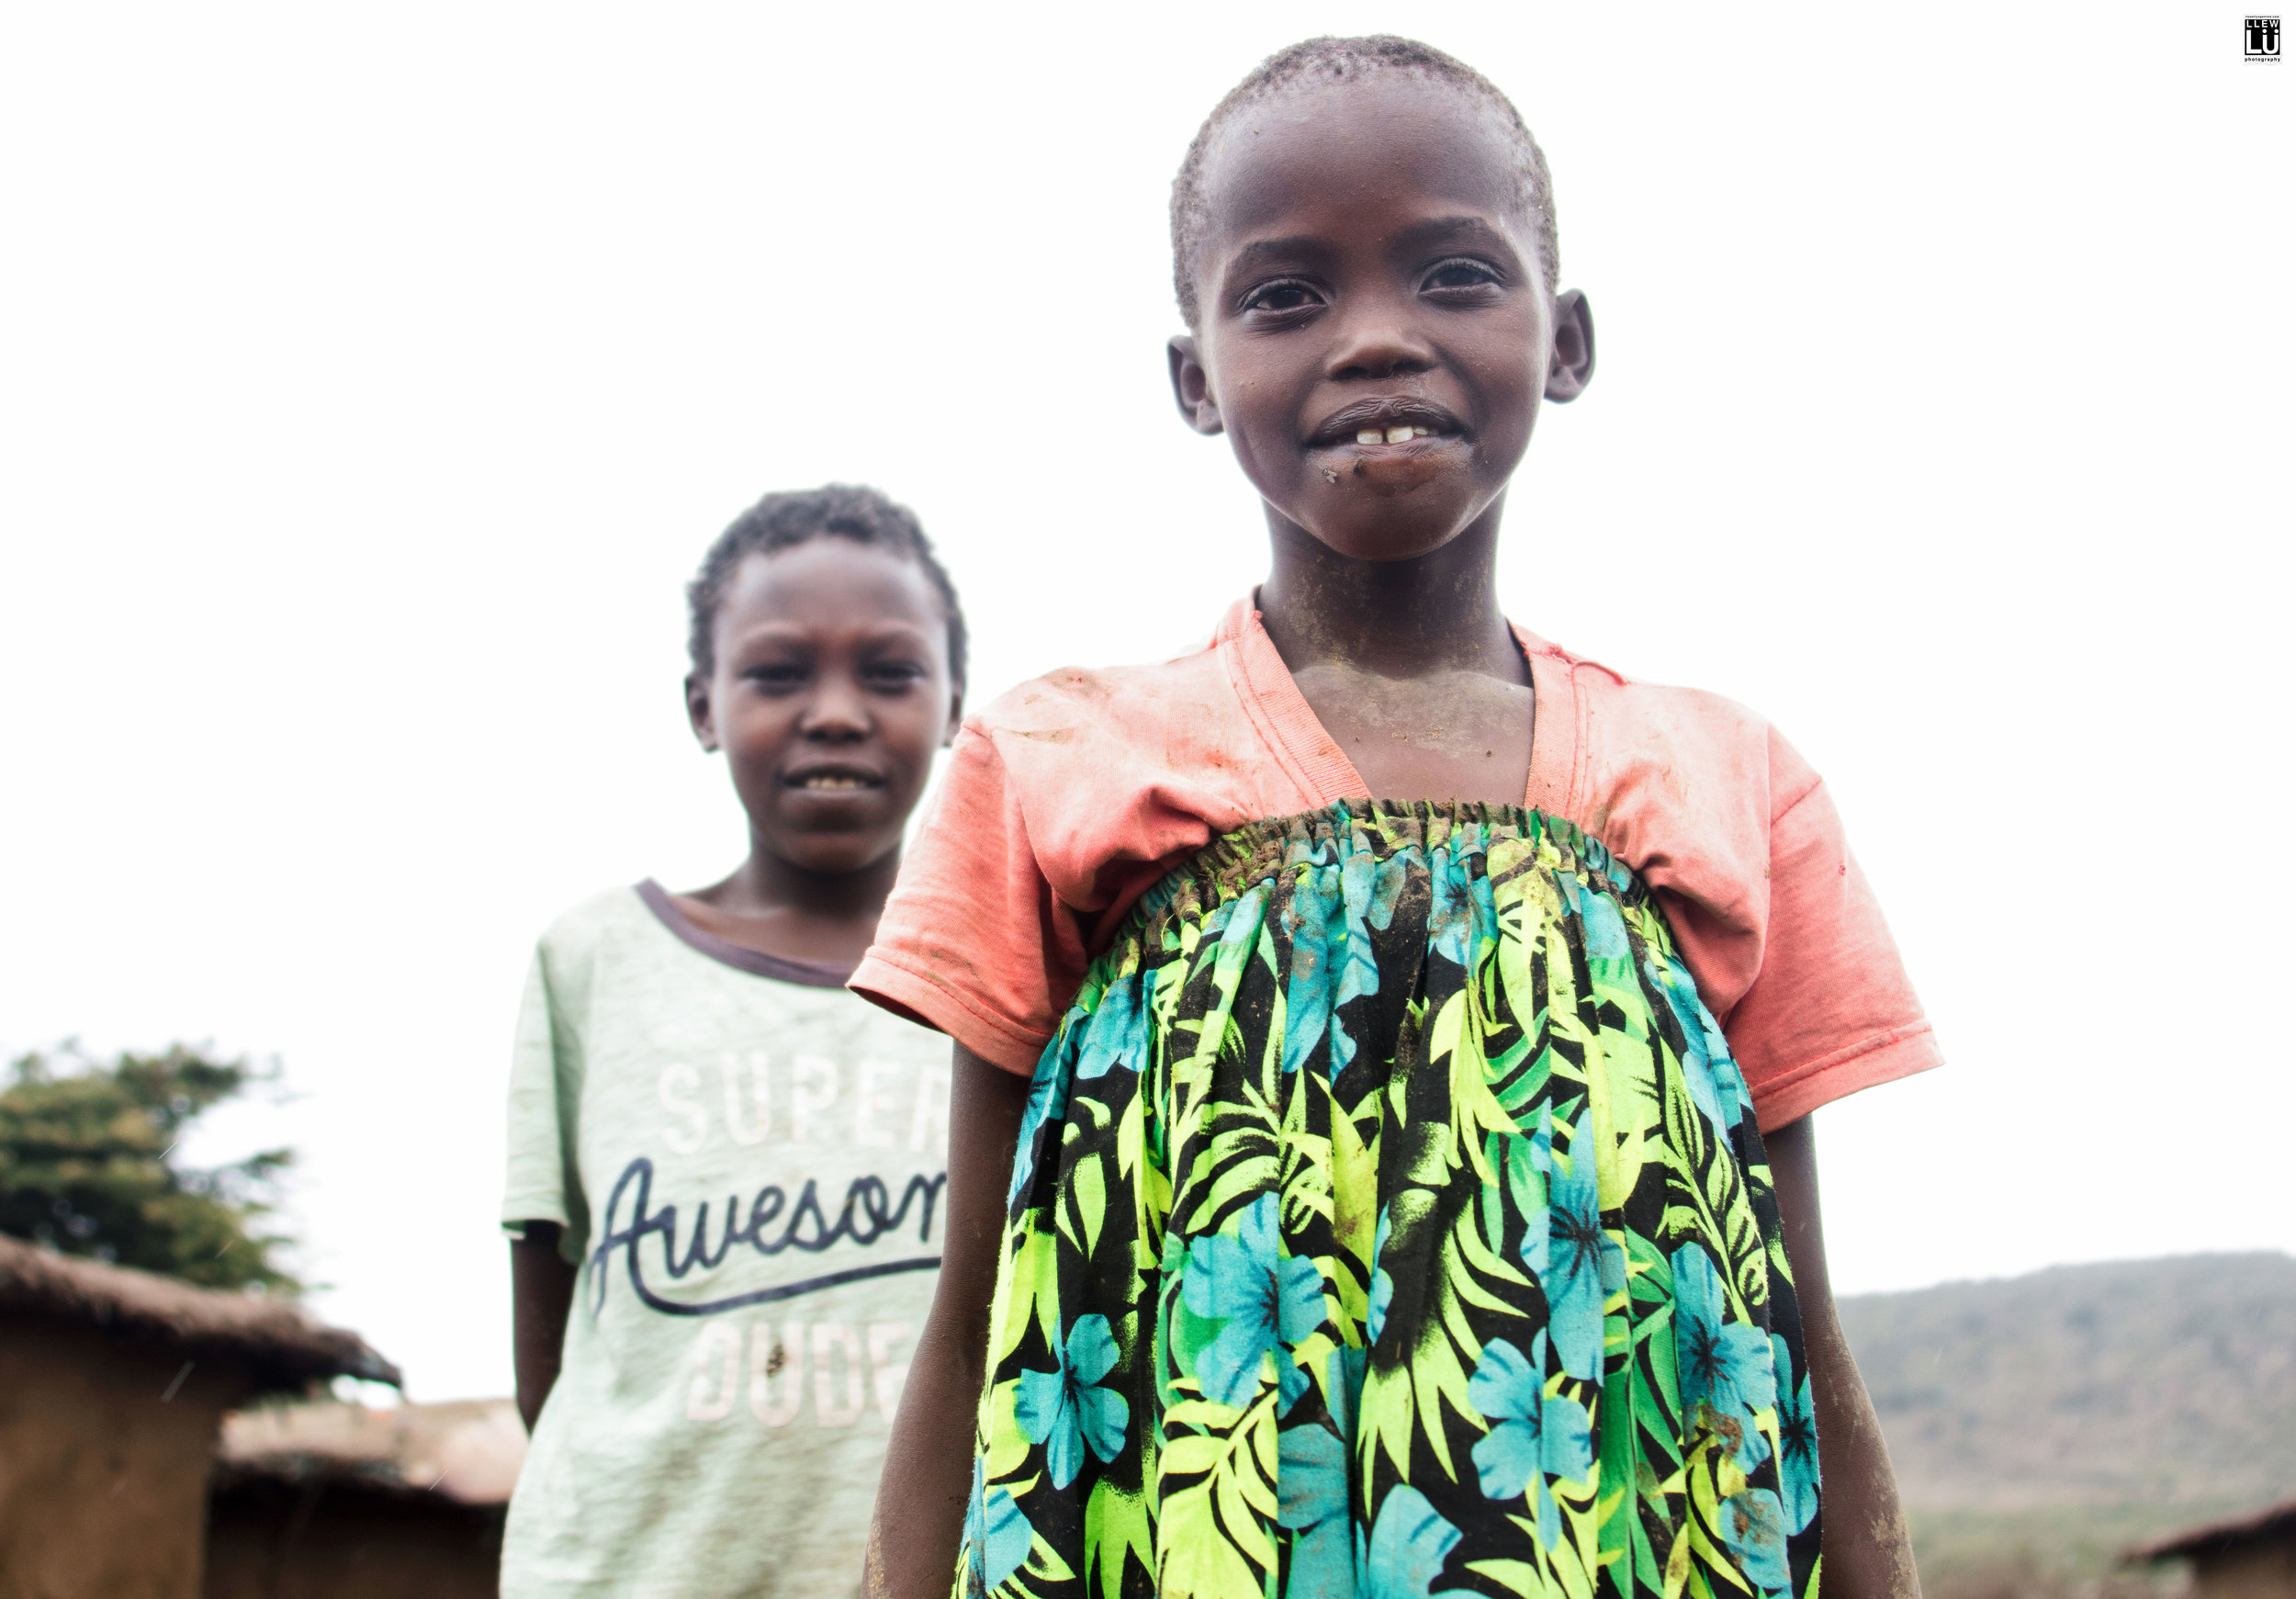 The children in the village were a pure delight!